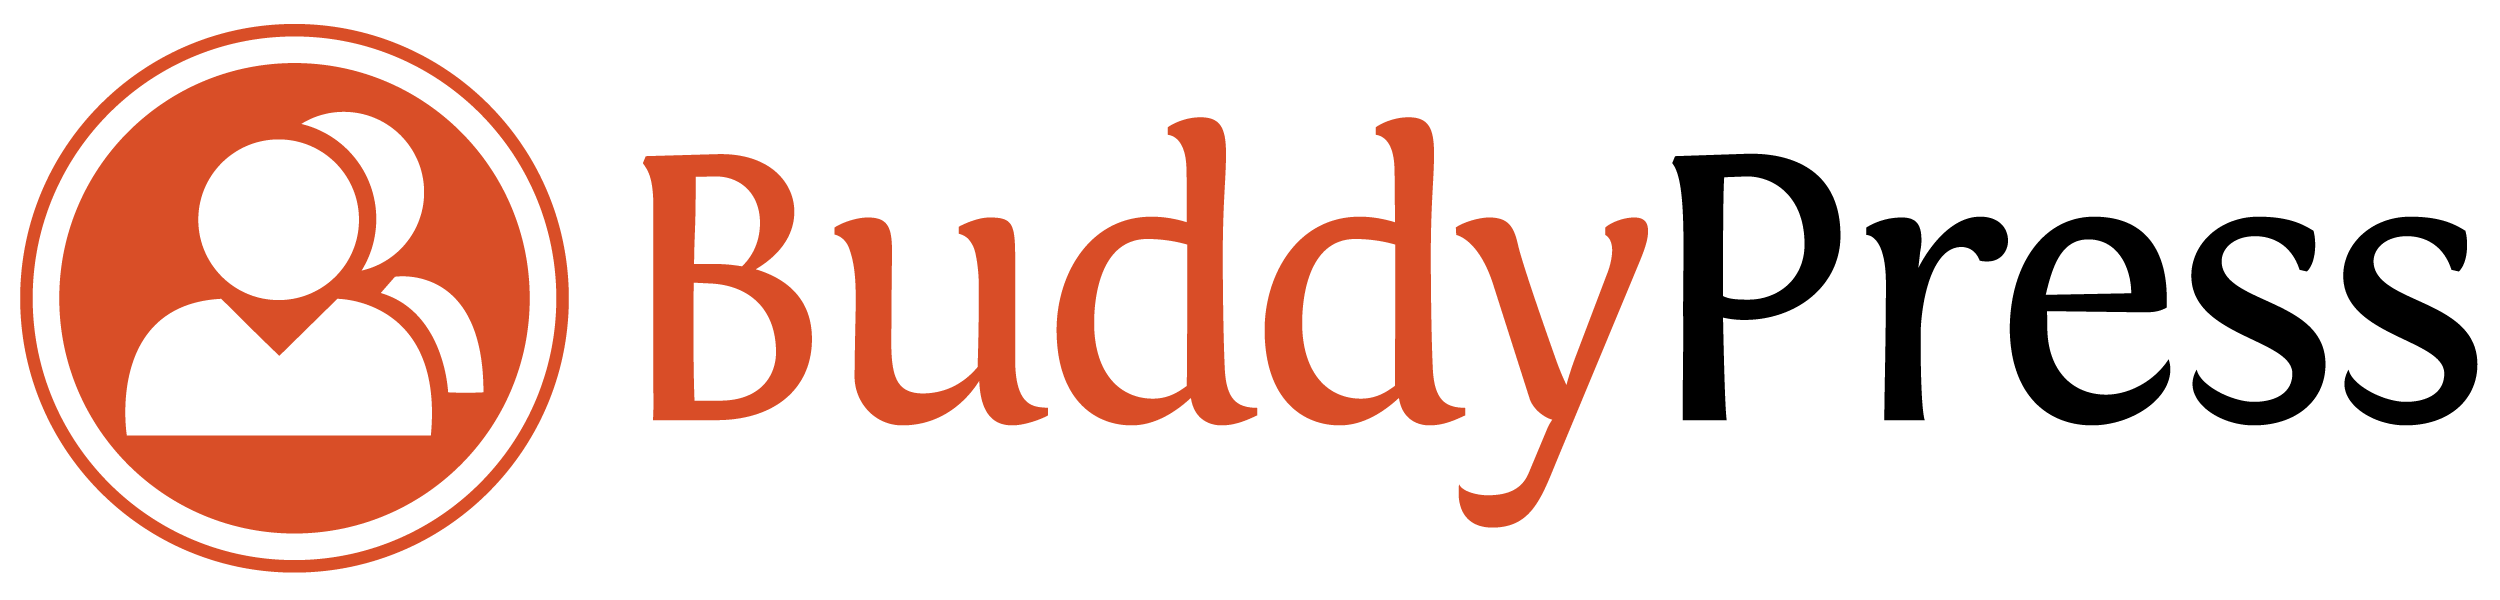 Kaycee meets BuddyPress